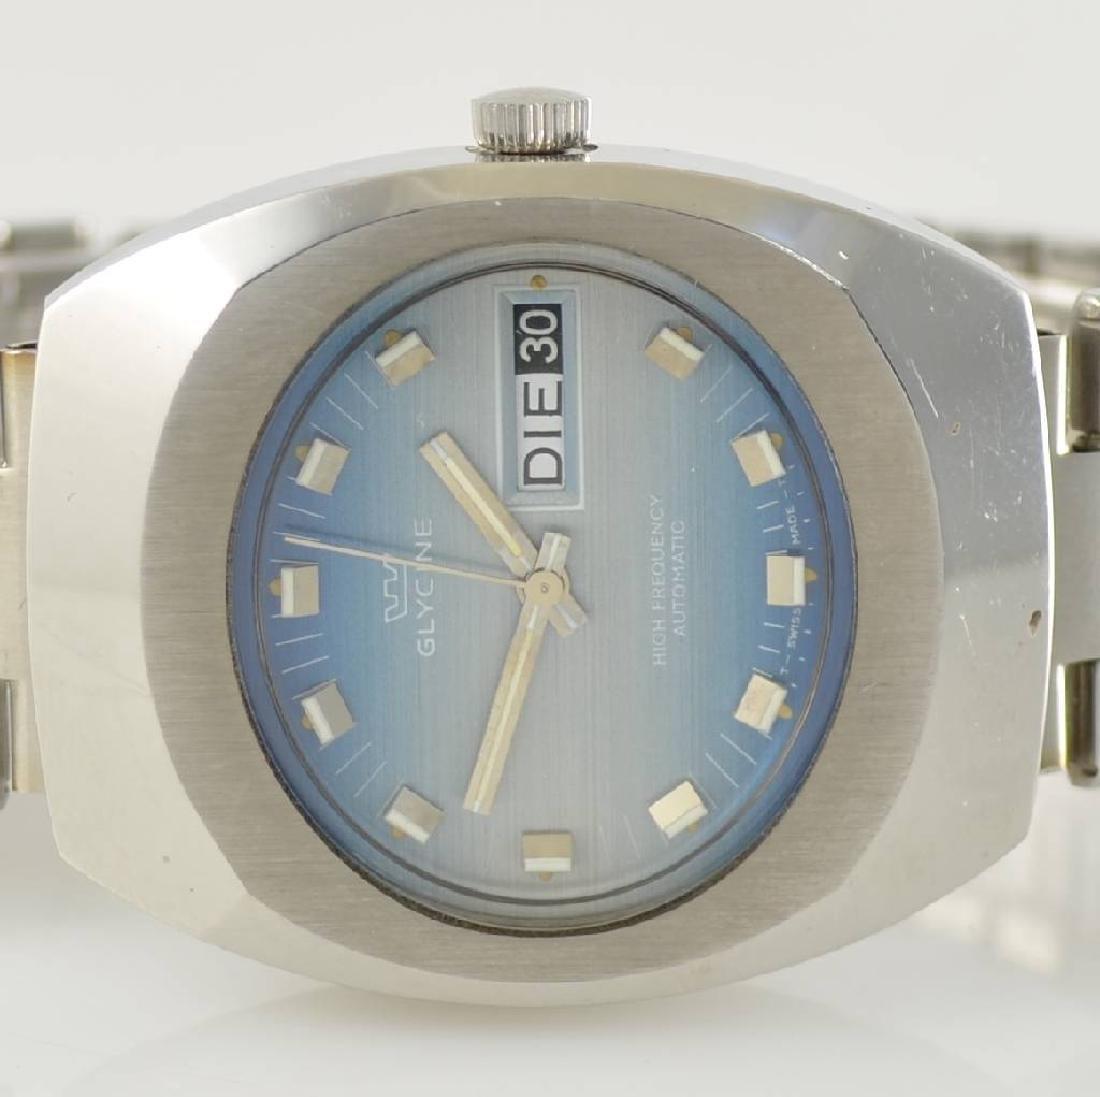 GLYCINE High Frequency gents wristwatch - 2